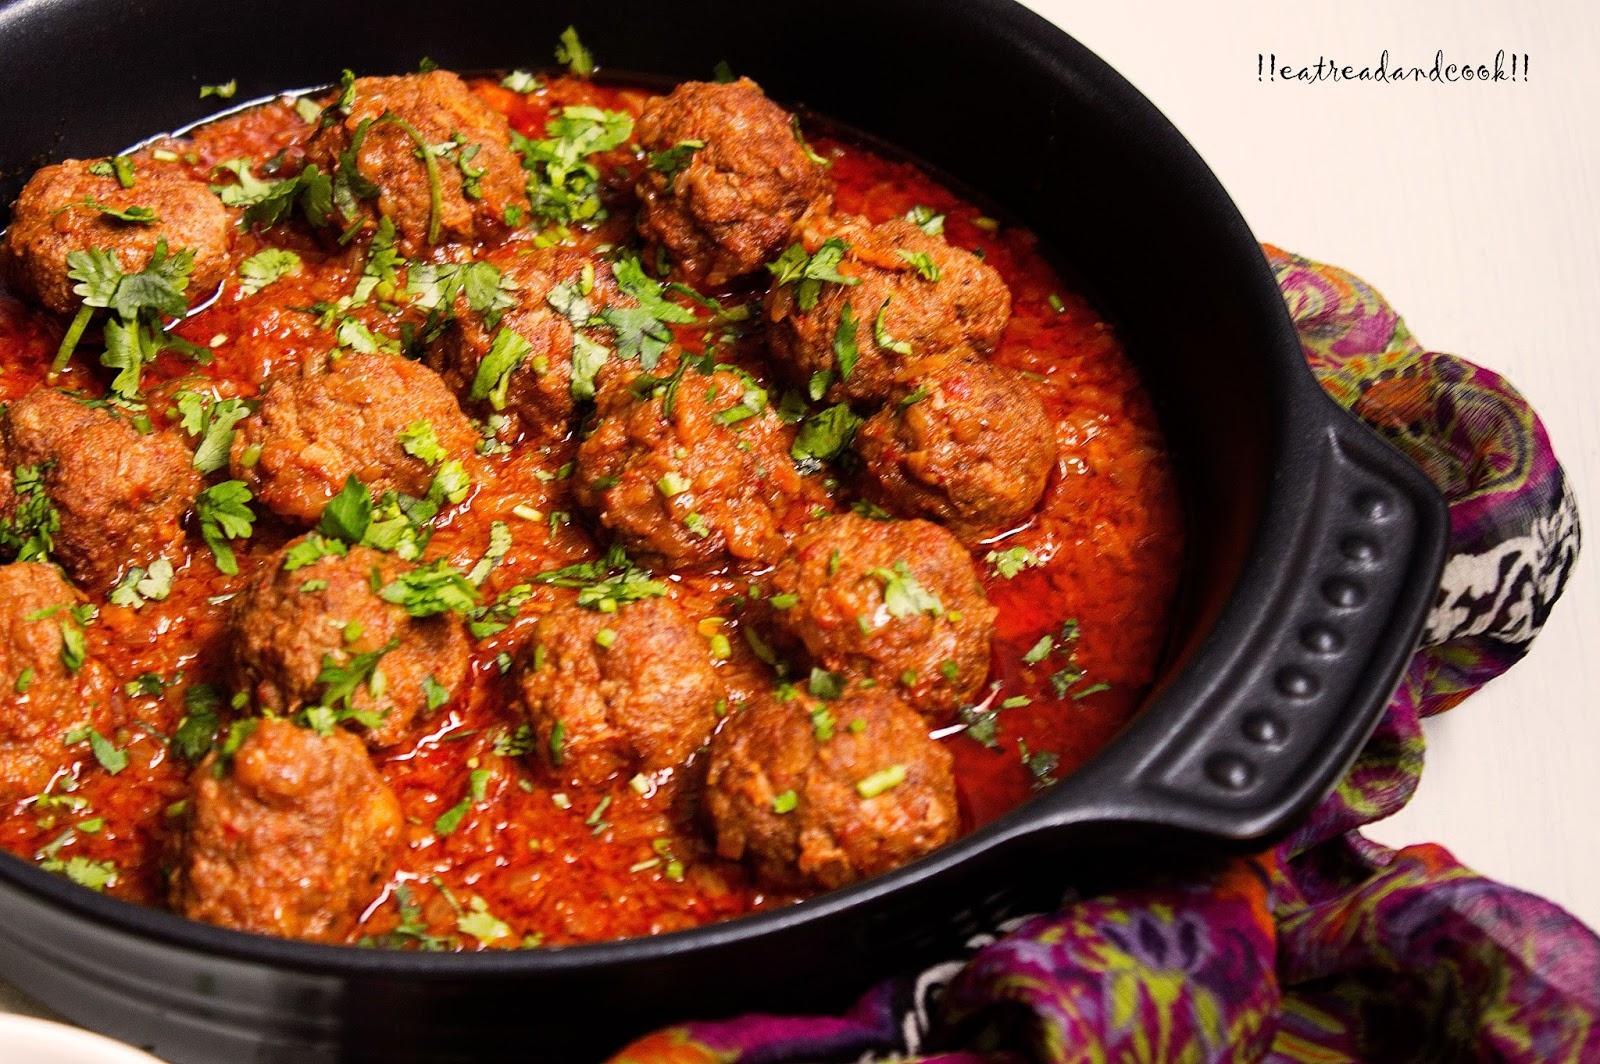 Afghani meatballs curry afghani kofta curry eat read cook how to make afghani meatball curry recipe afghani kofta challow recipe afghani meatballs recipe afghani kofta forumfinder Choice Image